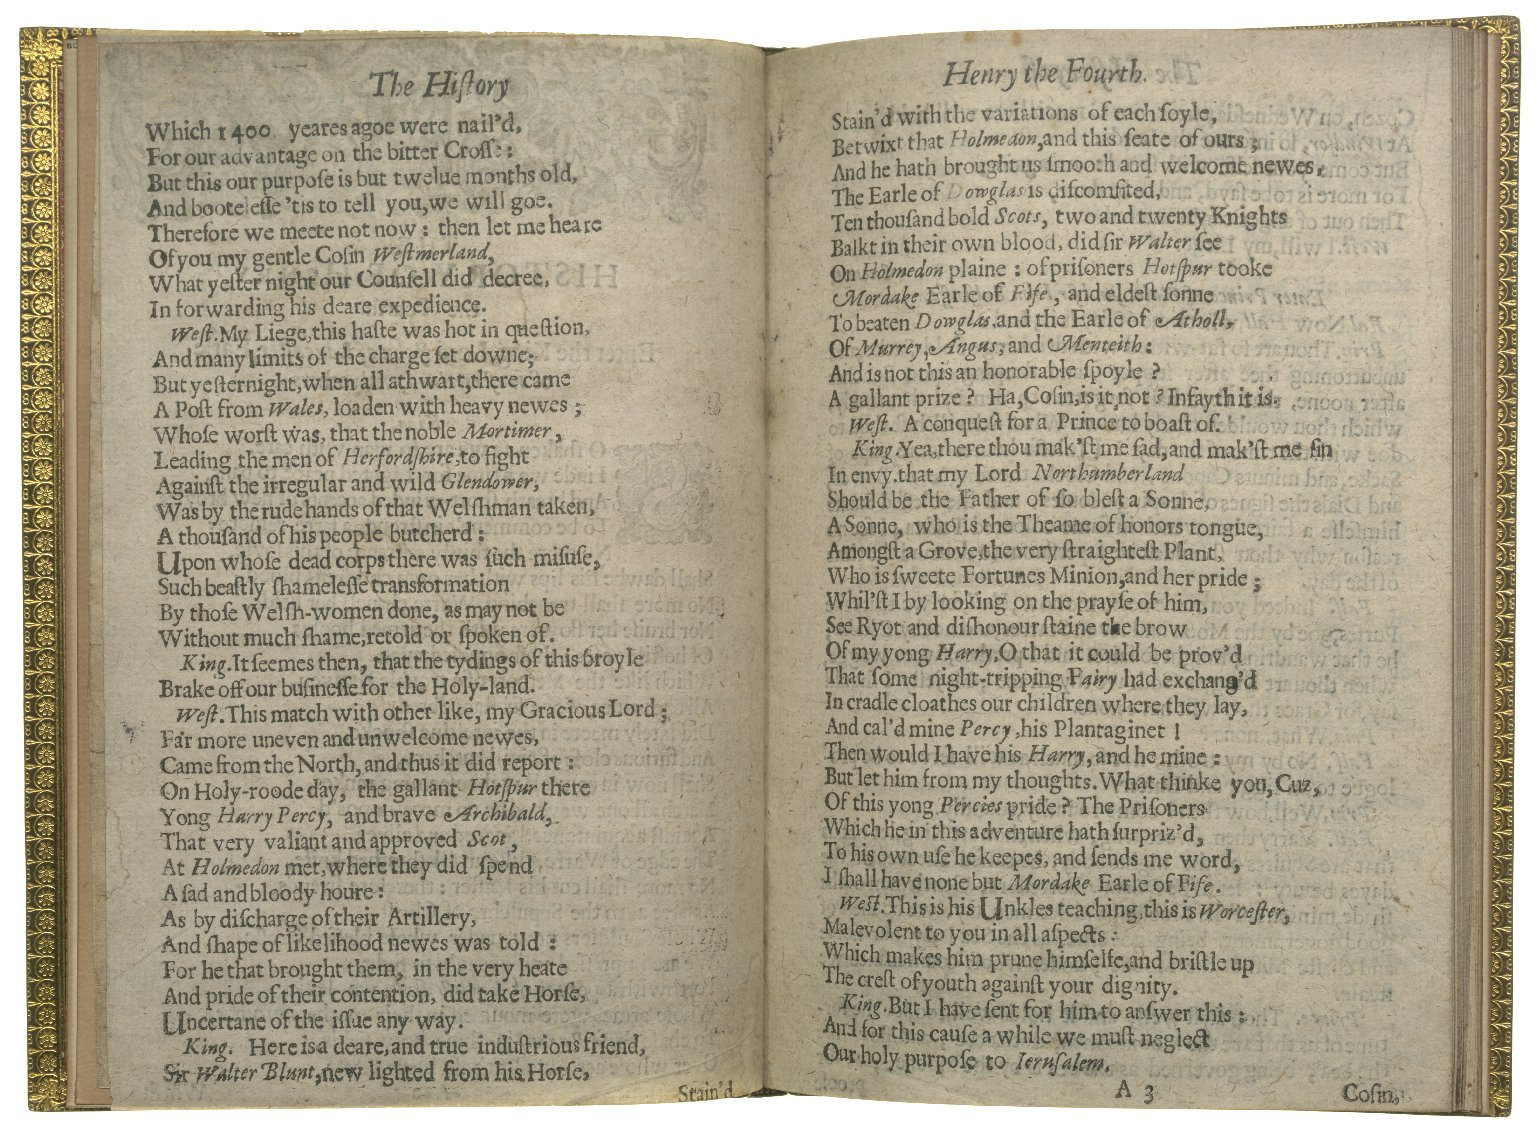 Henry IV, 1639, ff.2v-3r